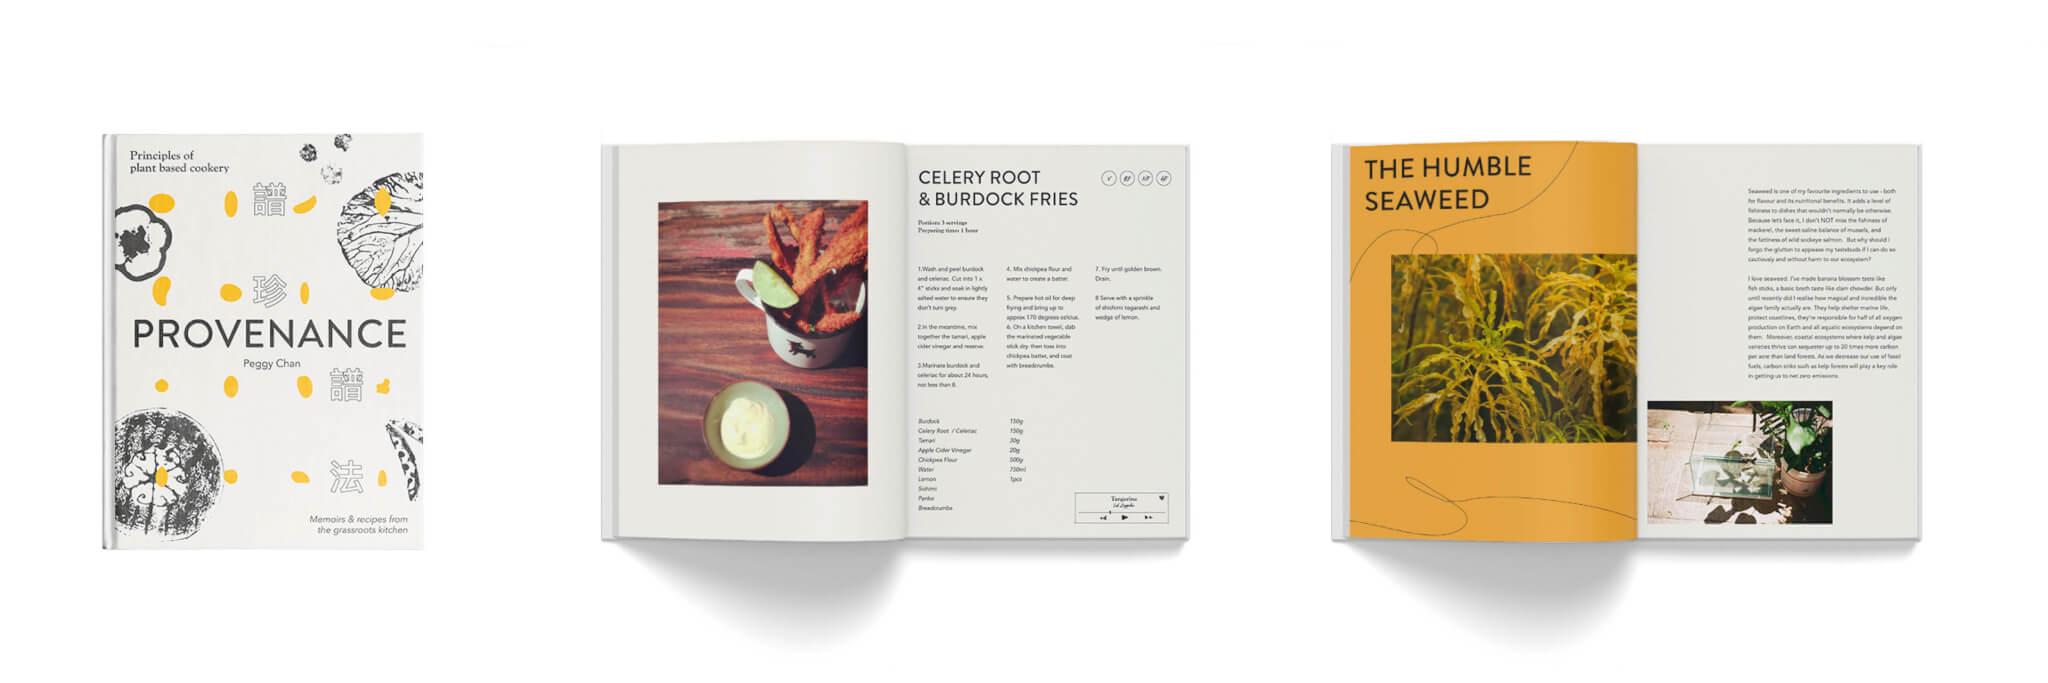 《Provenance譜珍譜法: Principles of plant-based cookery》 // 由Peggy所撰寫的新書內,收錄了許多與自然有關的食材,以及相關的烹調技巧。目前正在眾籌中。